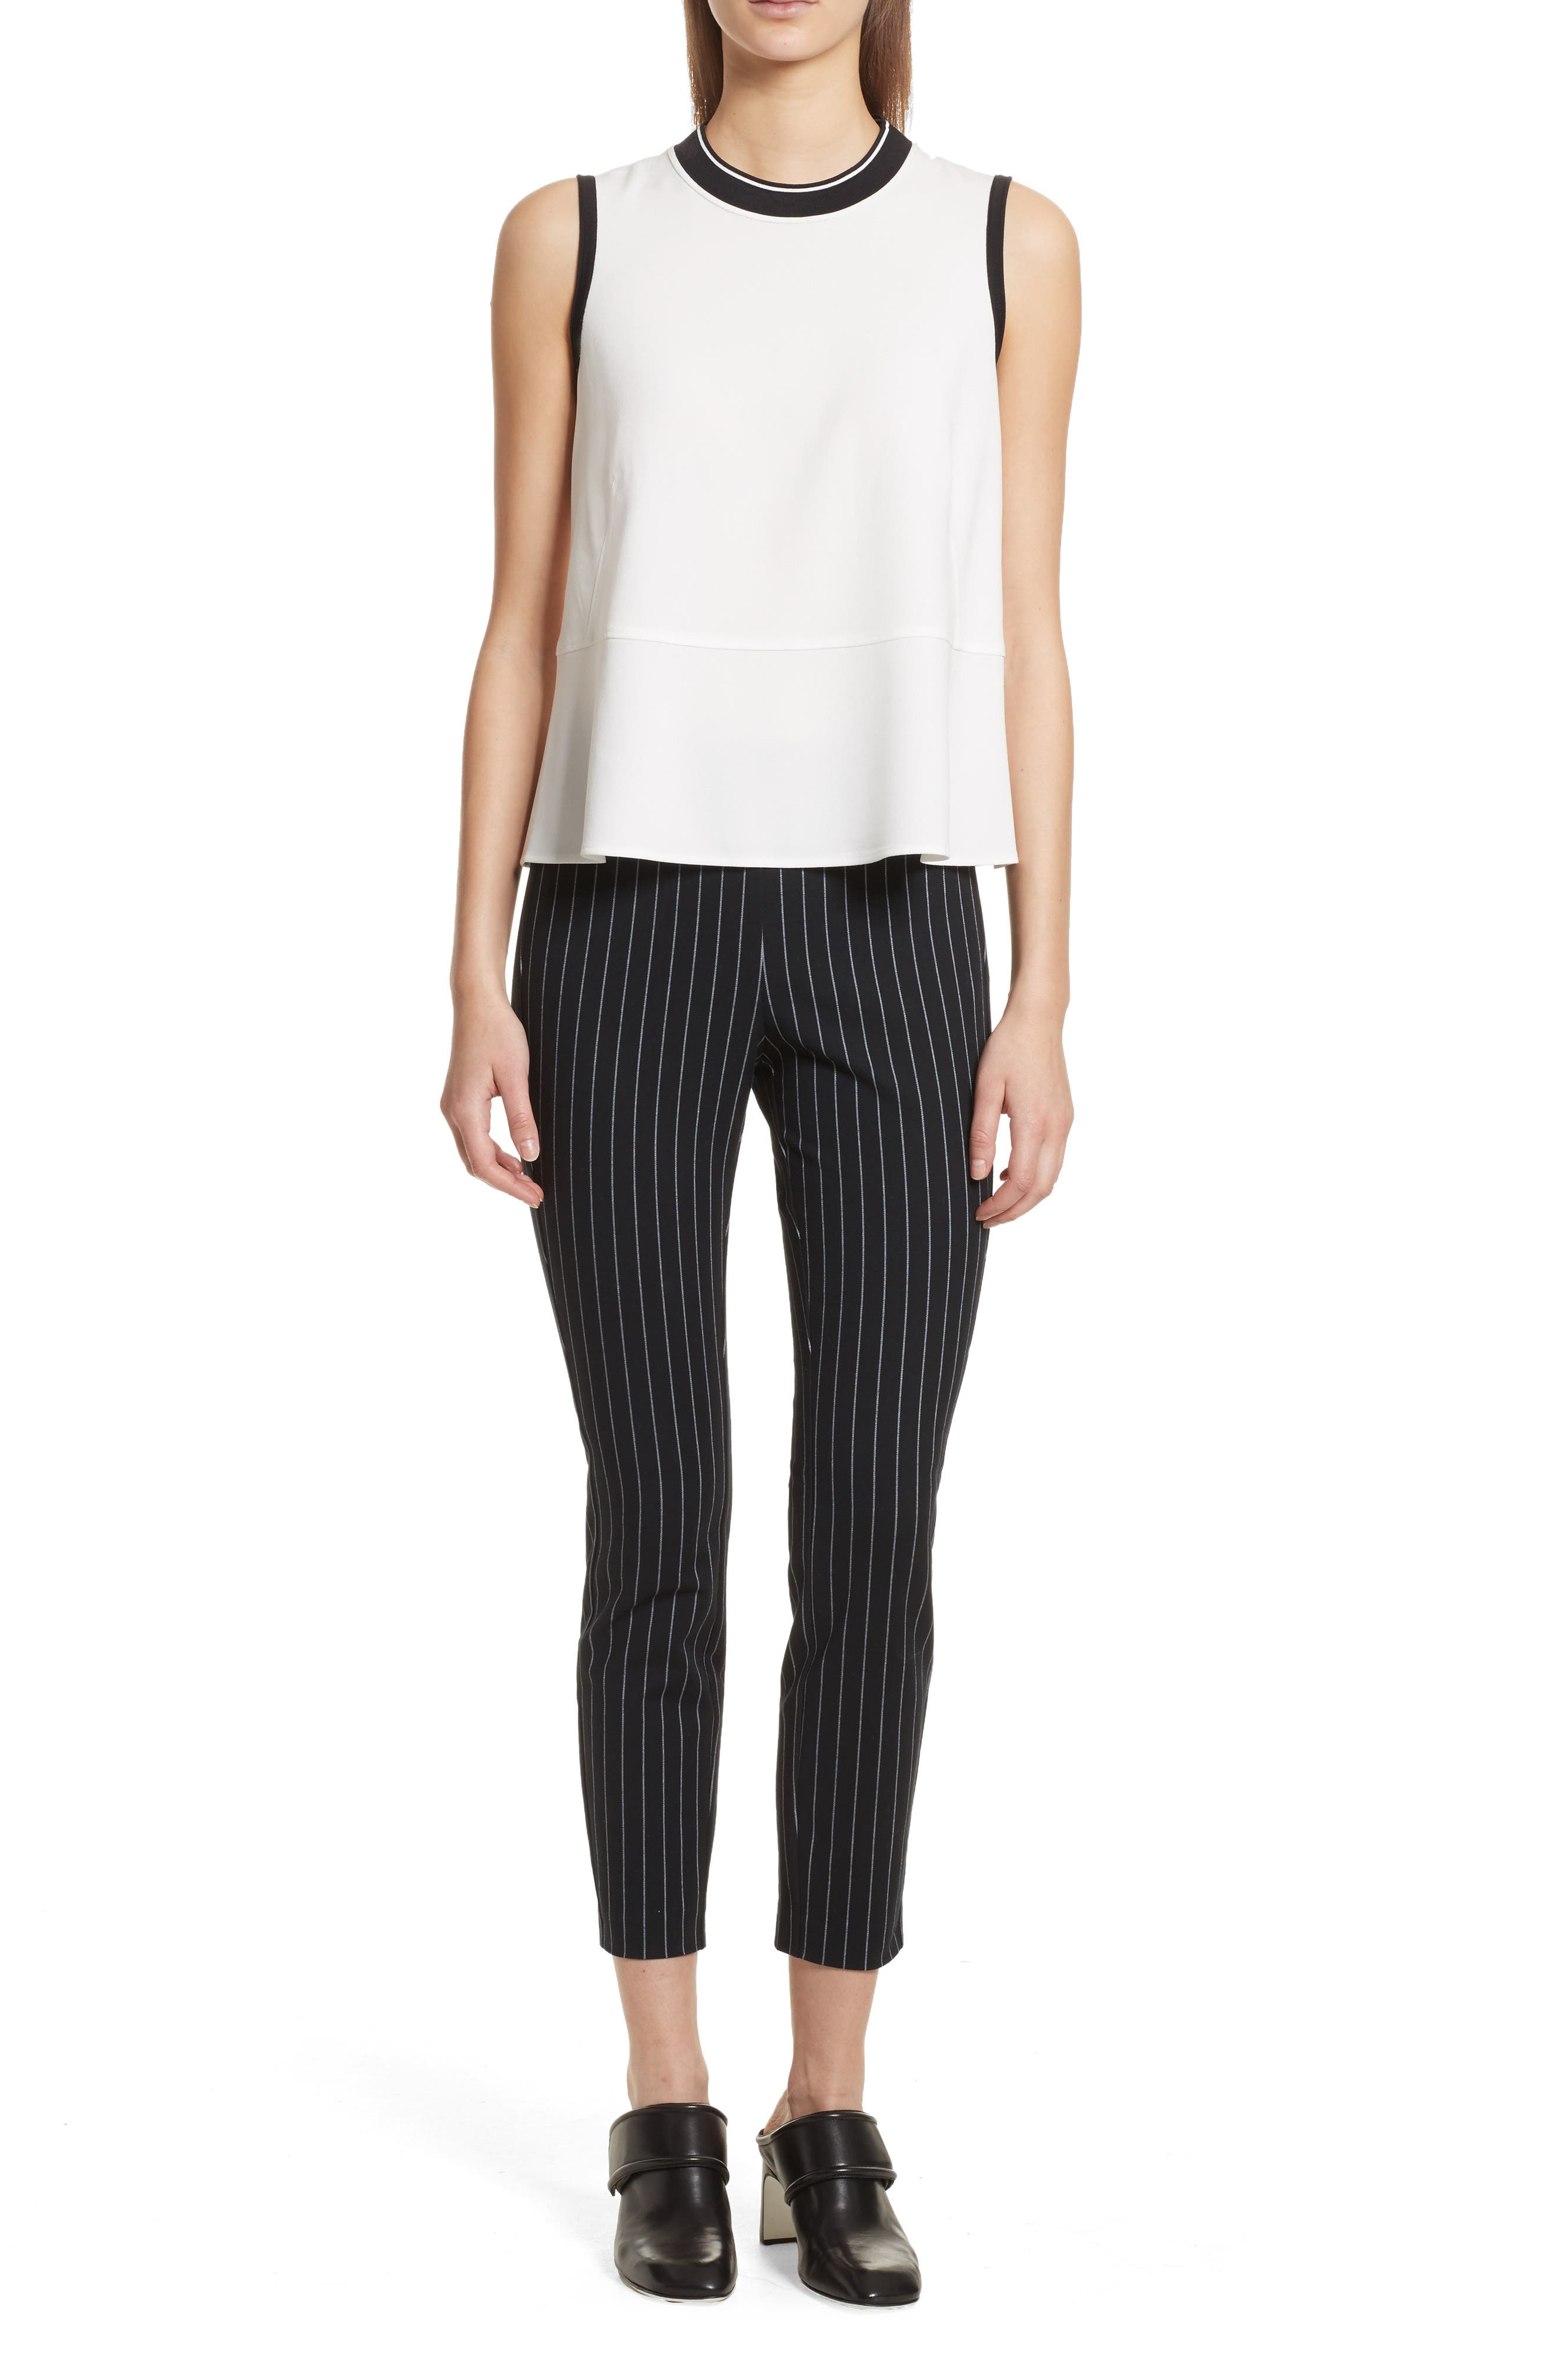 Simone Pinstripe Pants,                             Alternate thumbnail 7, color,                             Black/ White